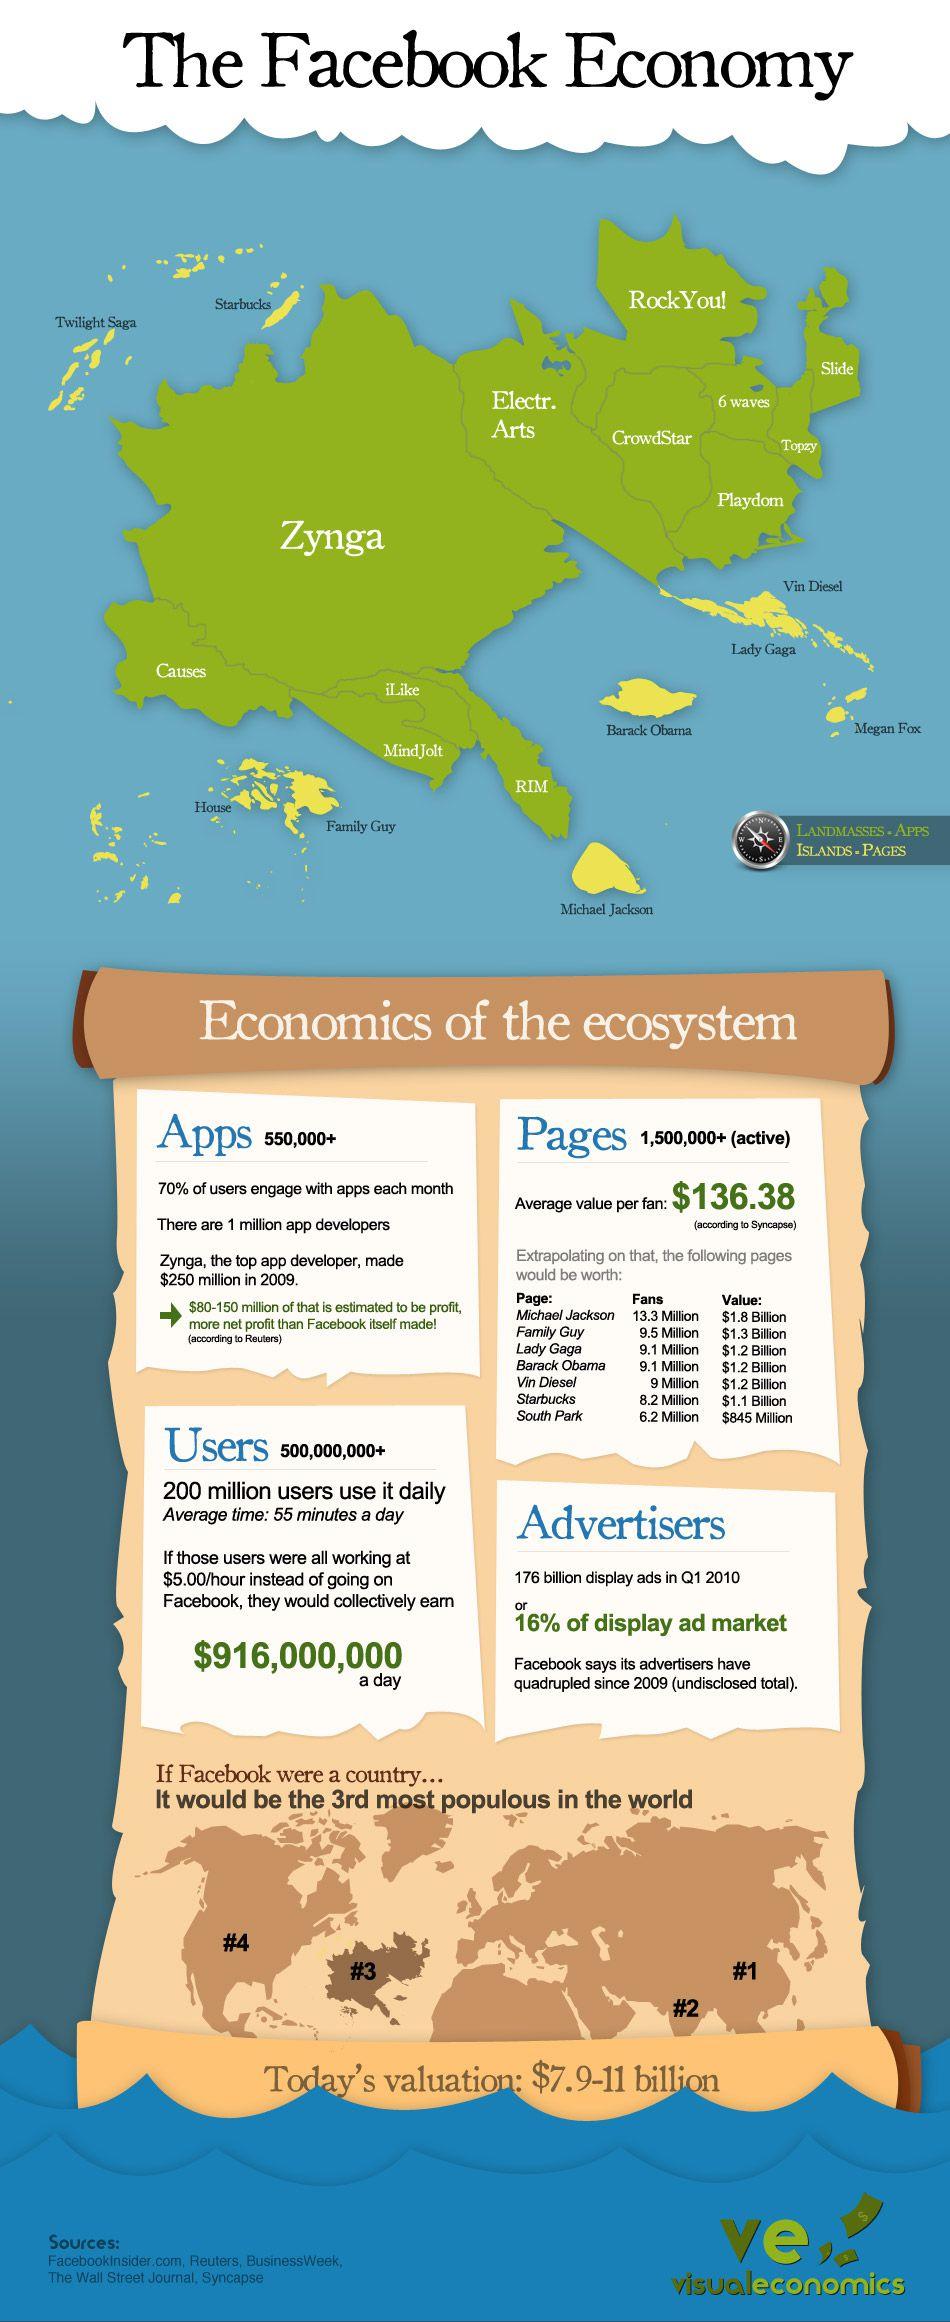 http://www.visualeconomics.com/wp-content/uploads/2010/06/facebook-economy.jpg